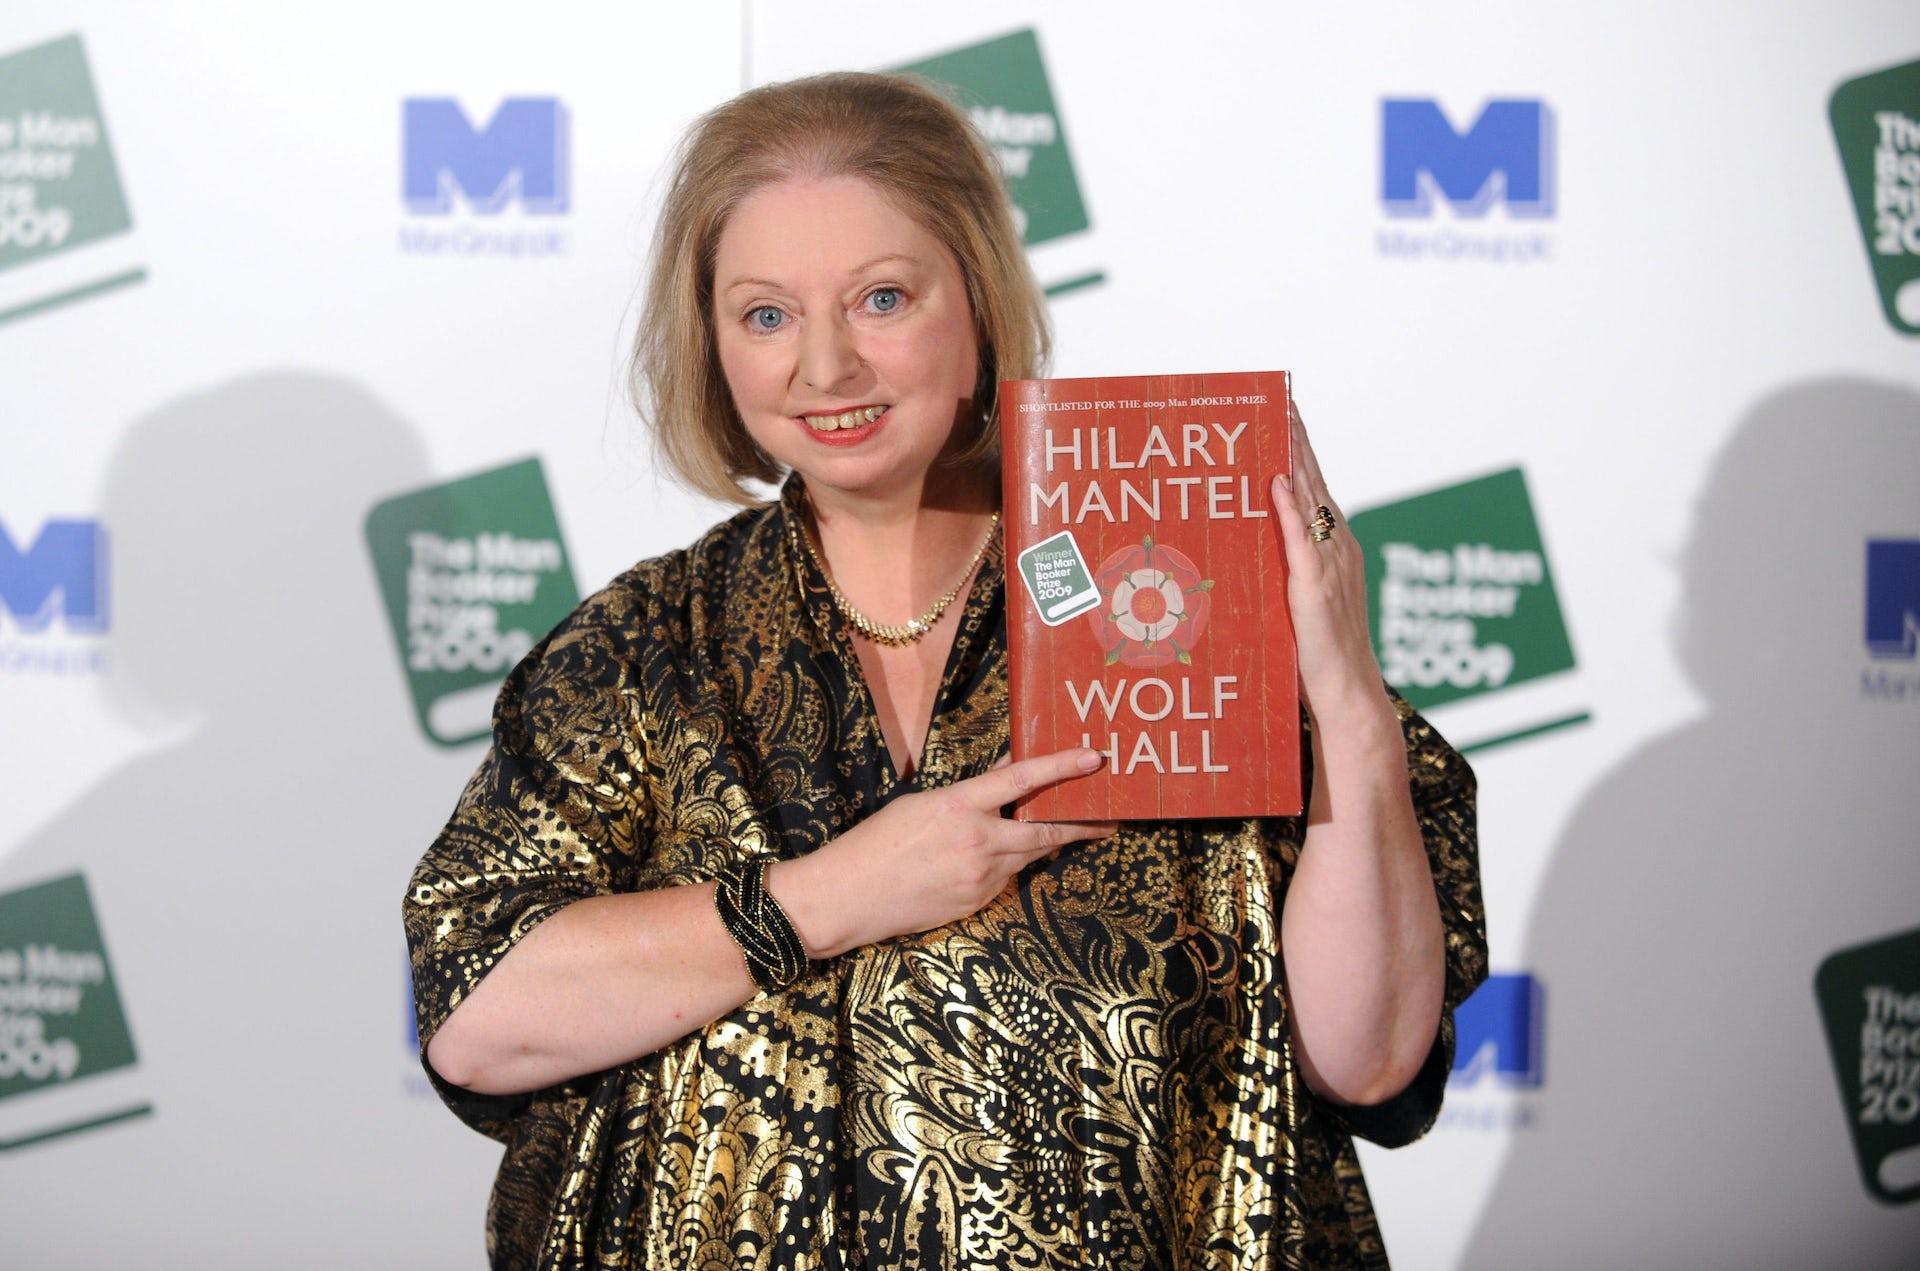 Hilary mantel on not winning awards